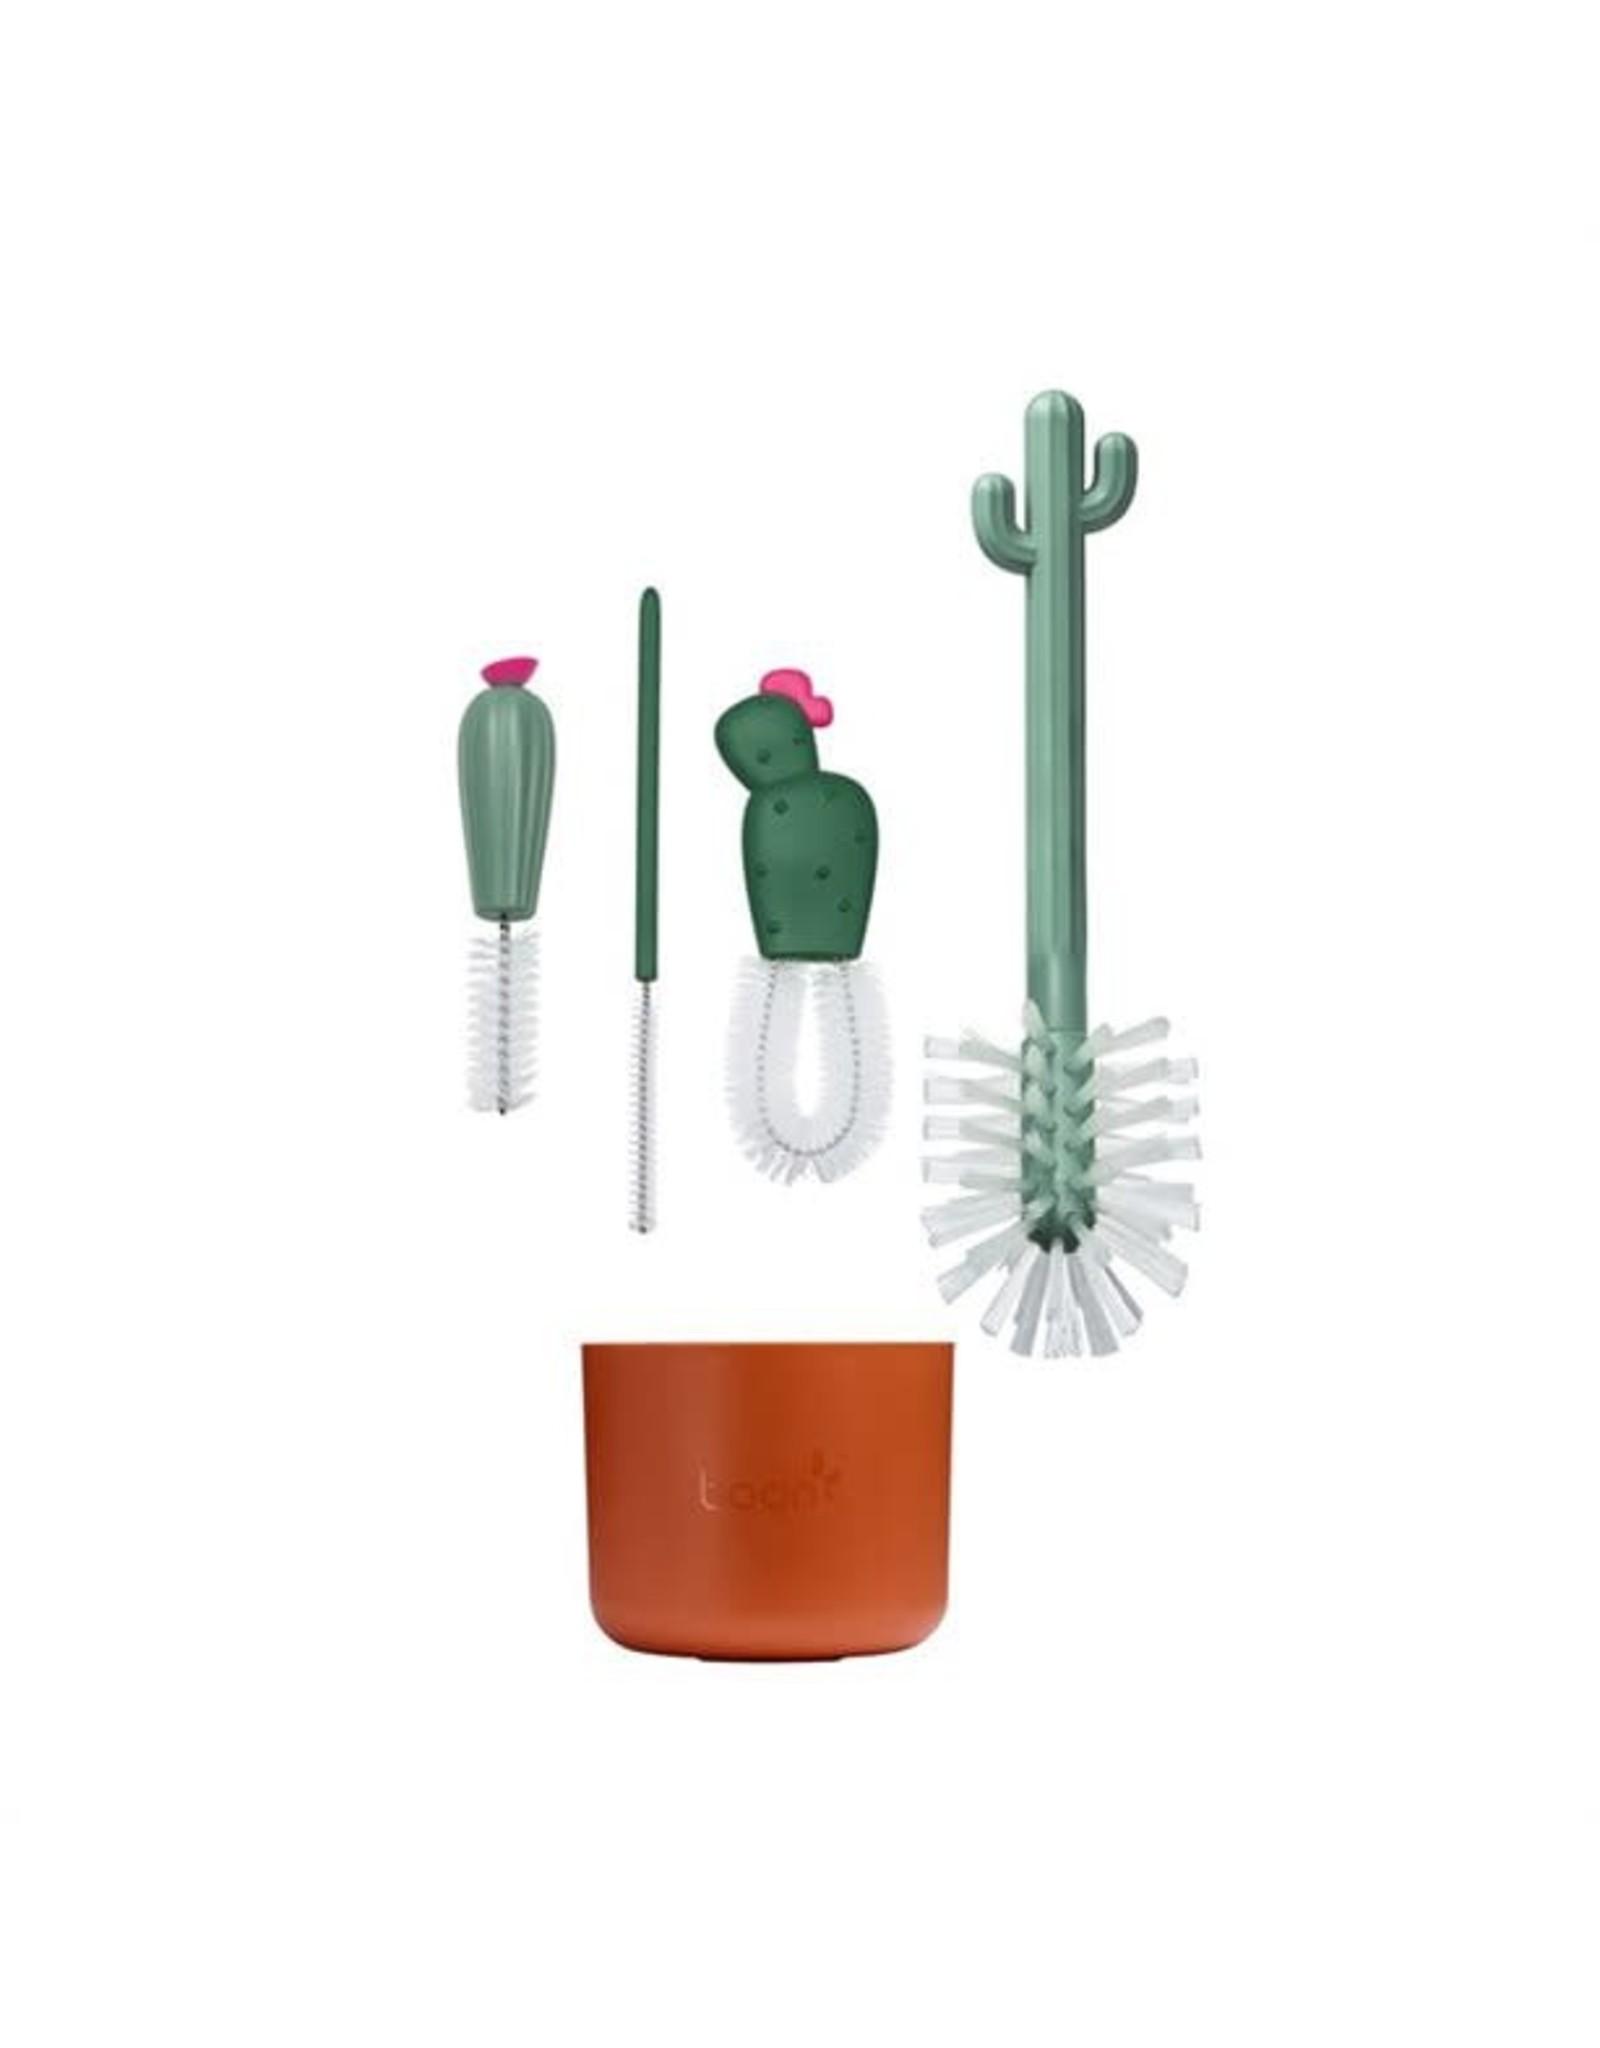 Boon Cacti Brush Set Brown/Dark Green